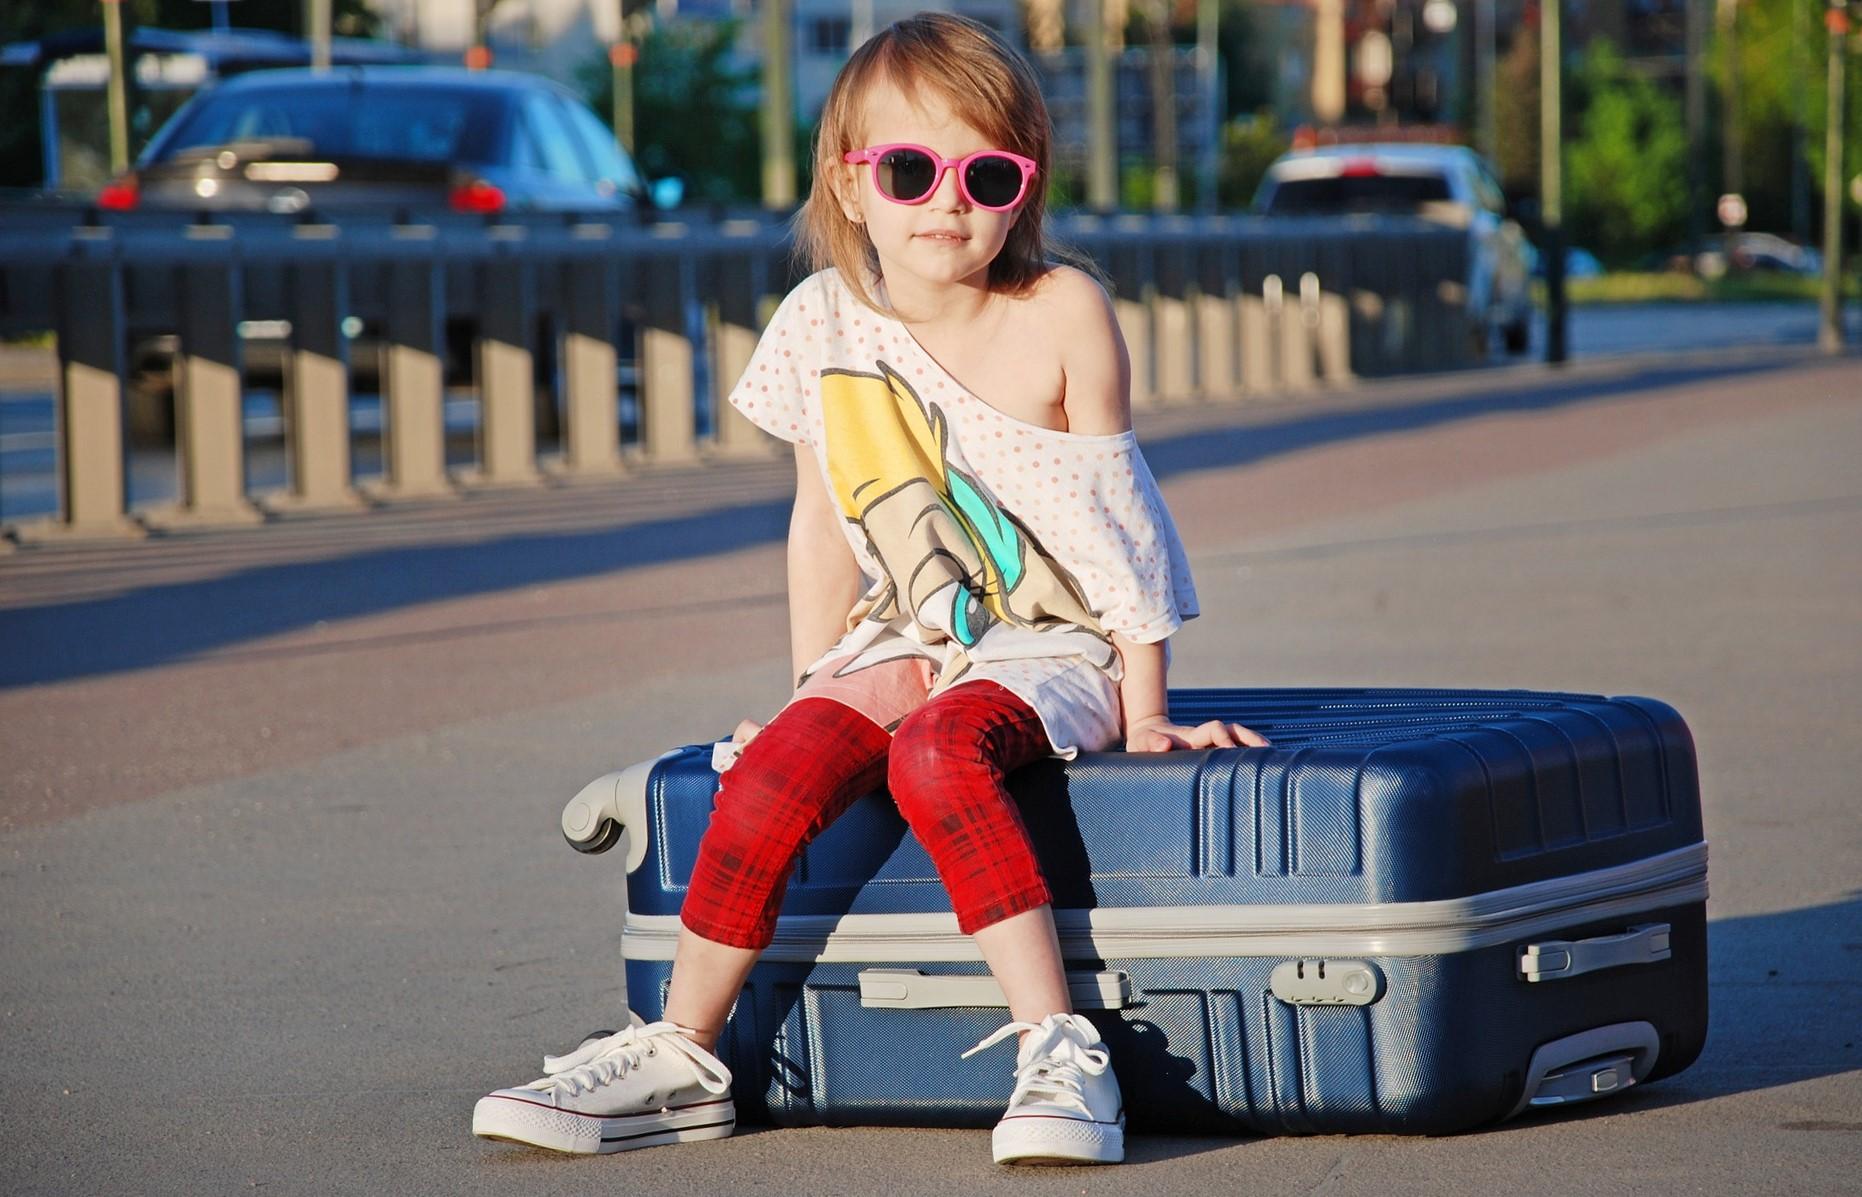 Niña sentada sobre una maleta